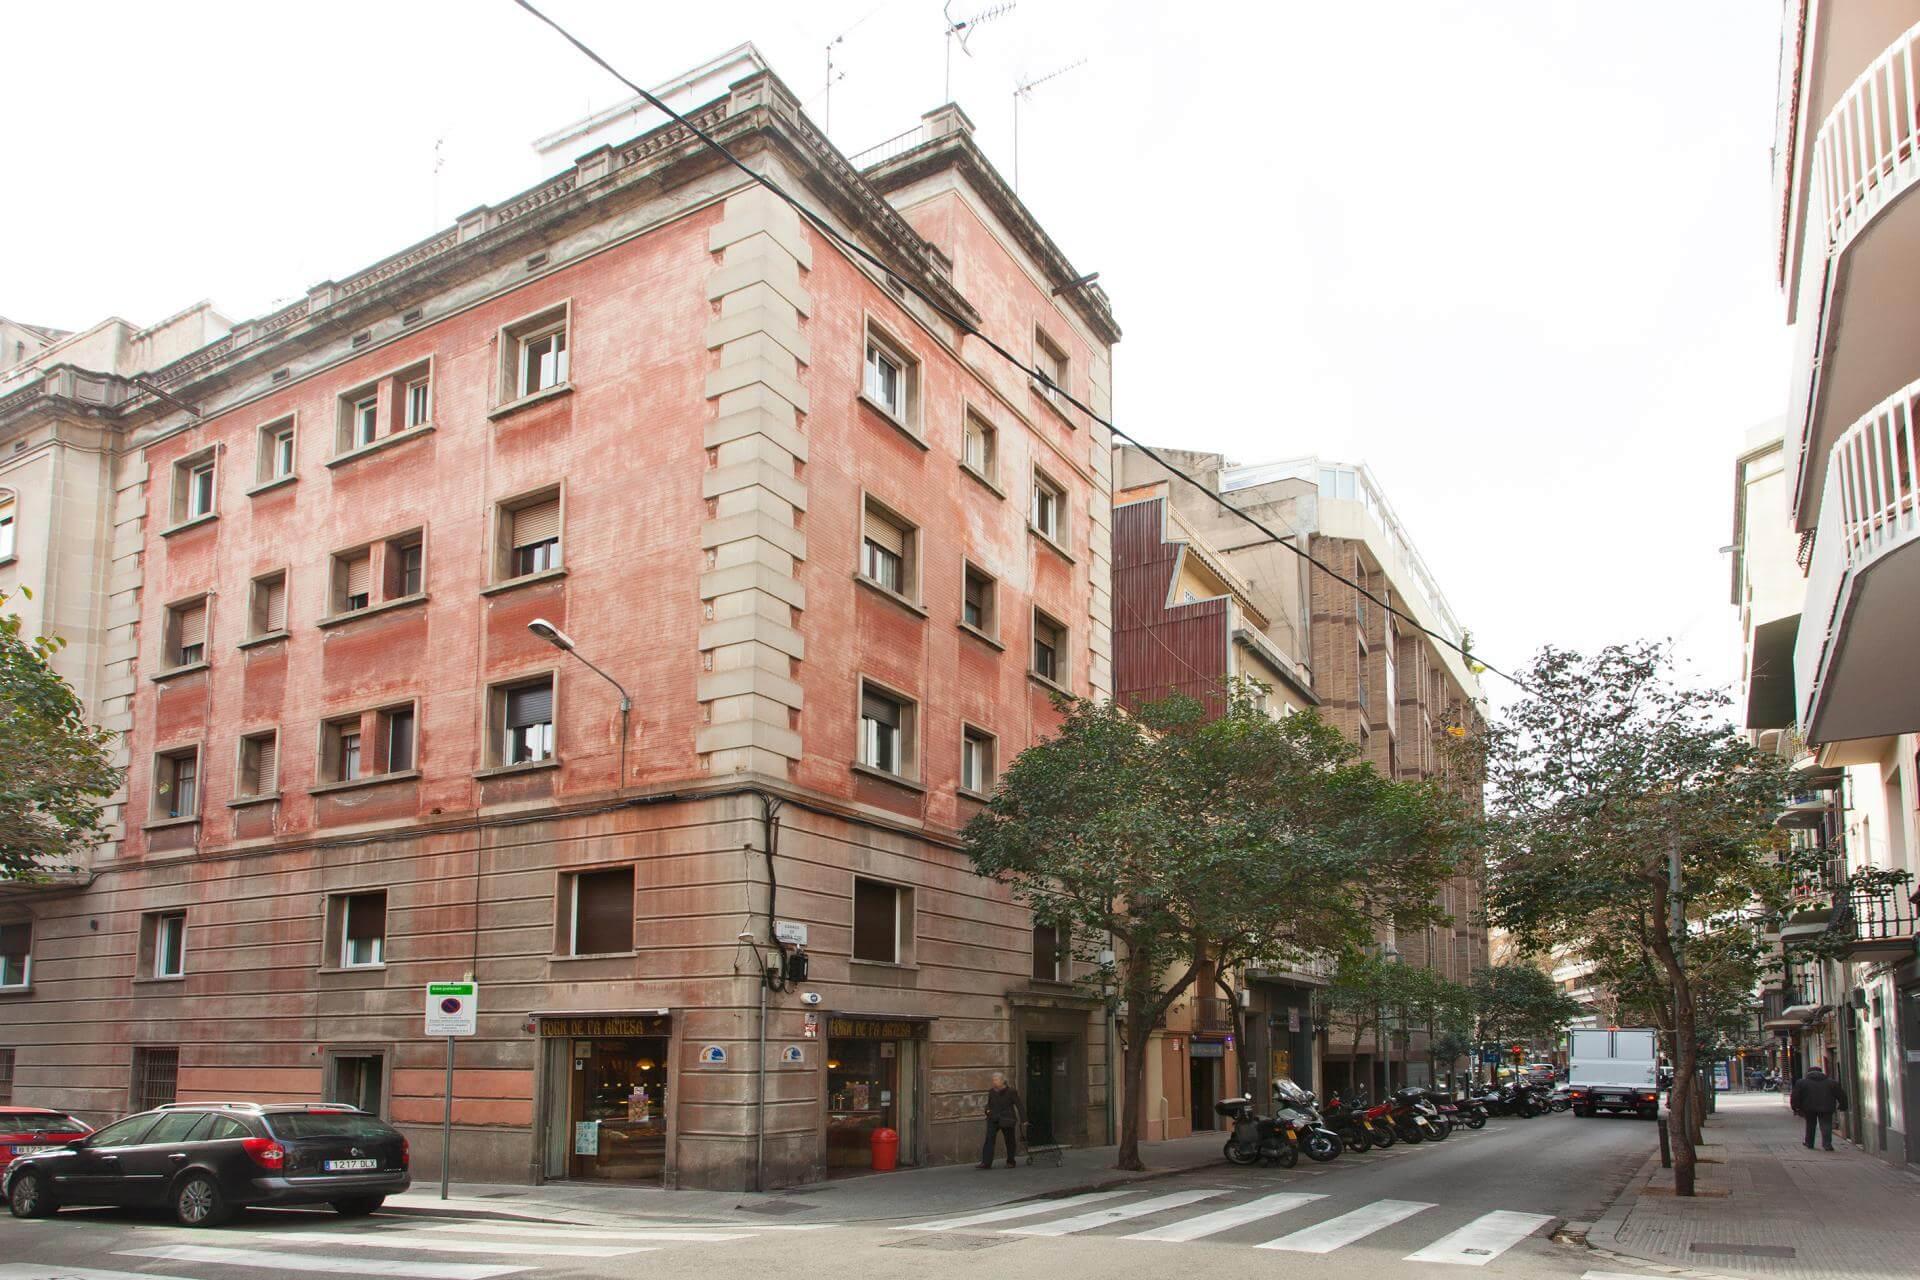 Shbarcelona piso de alquiler mensual sarri sant gervasi - Pisos alquiler sarria barcelona ...